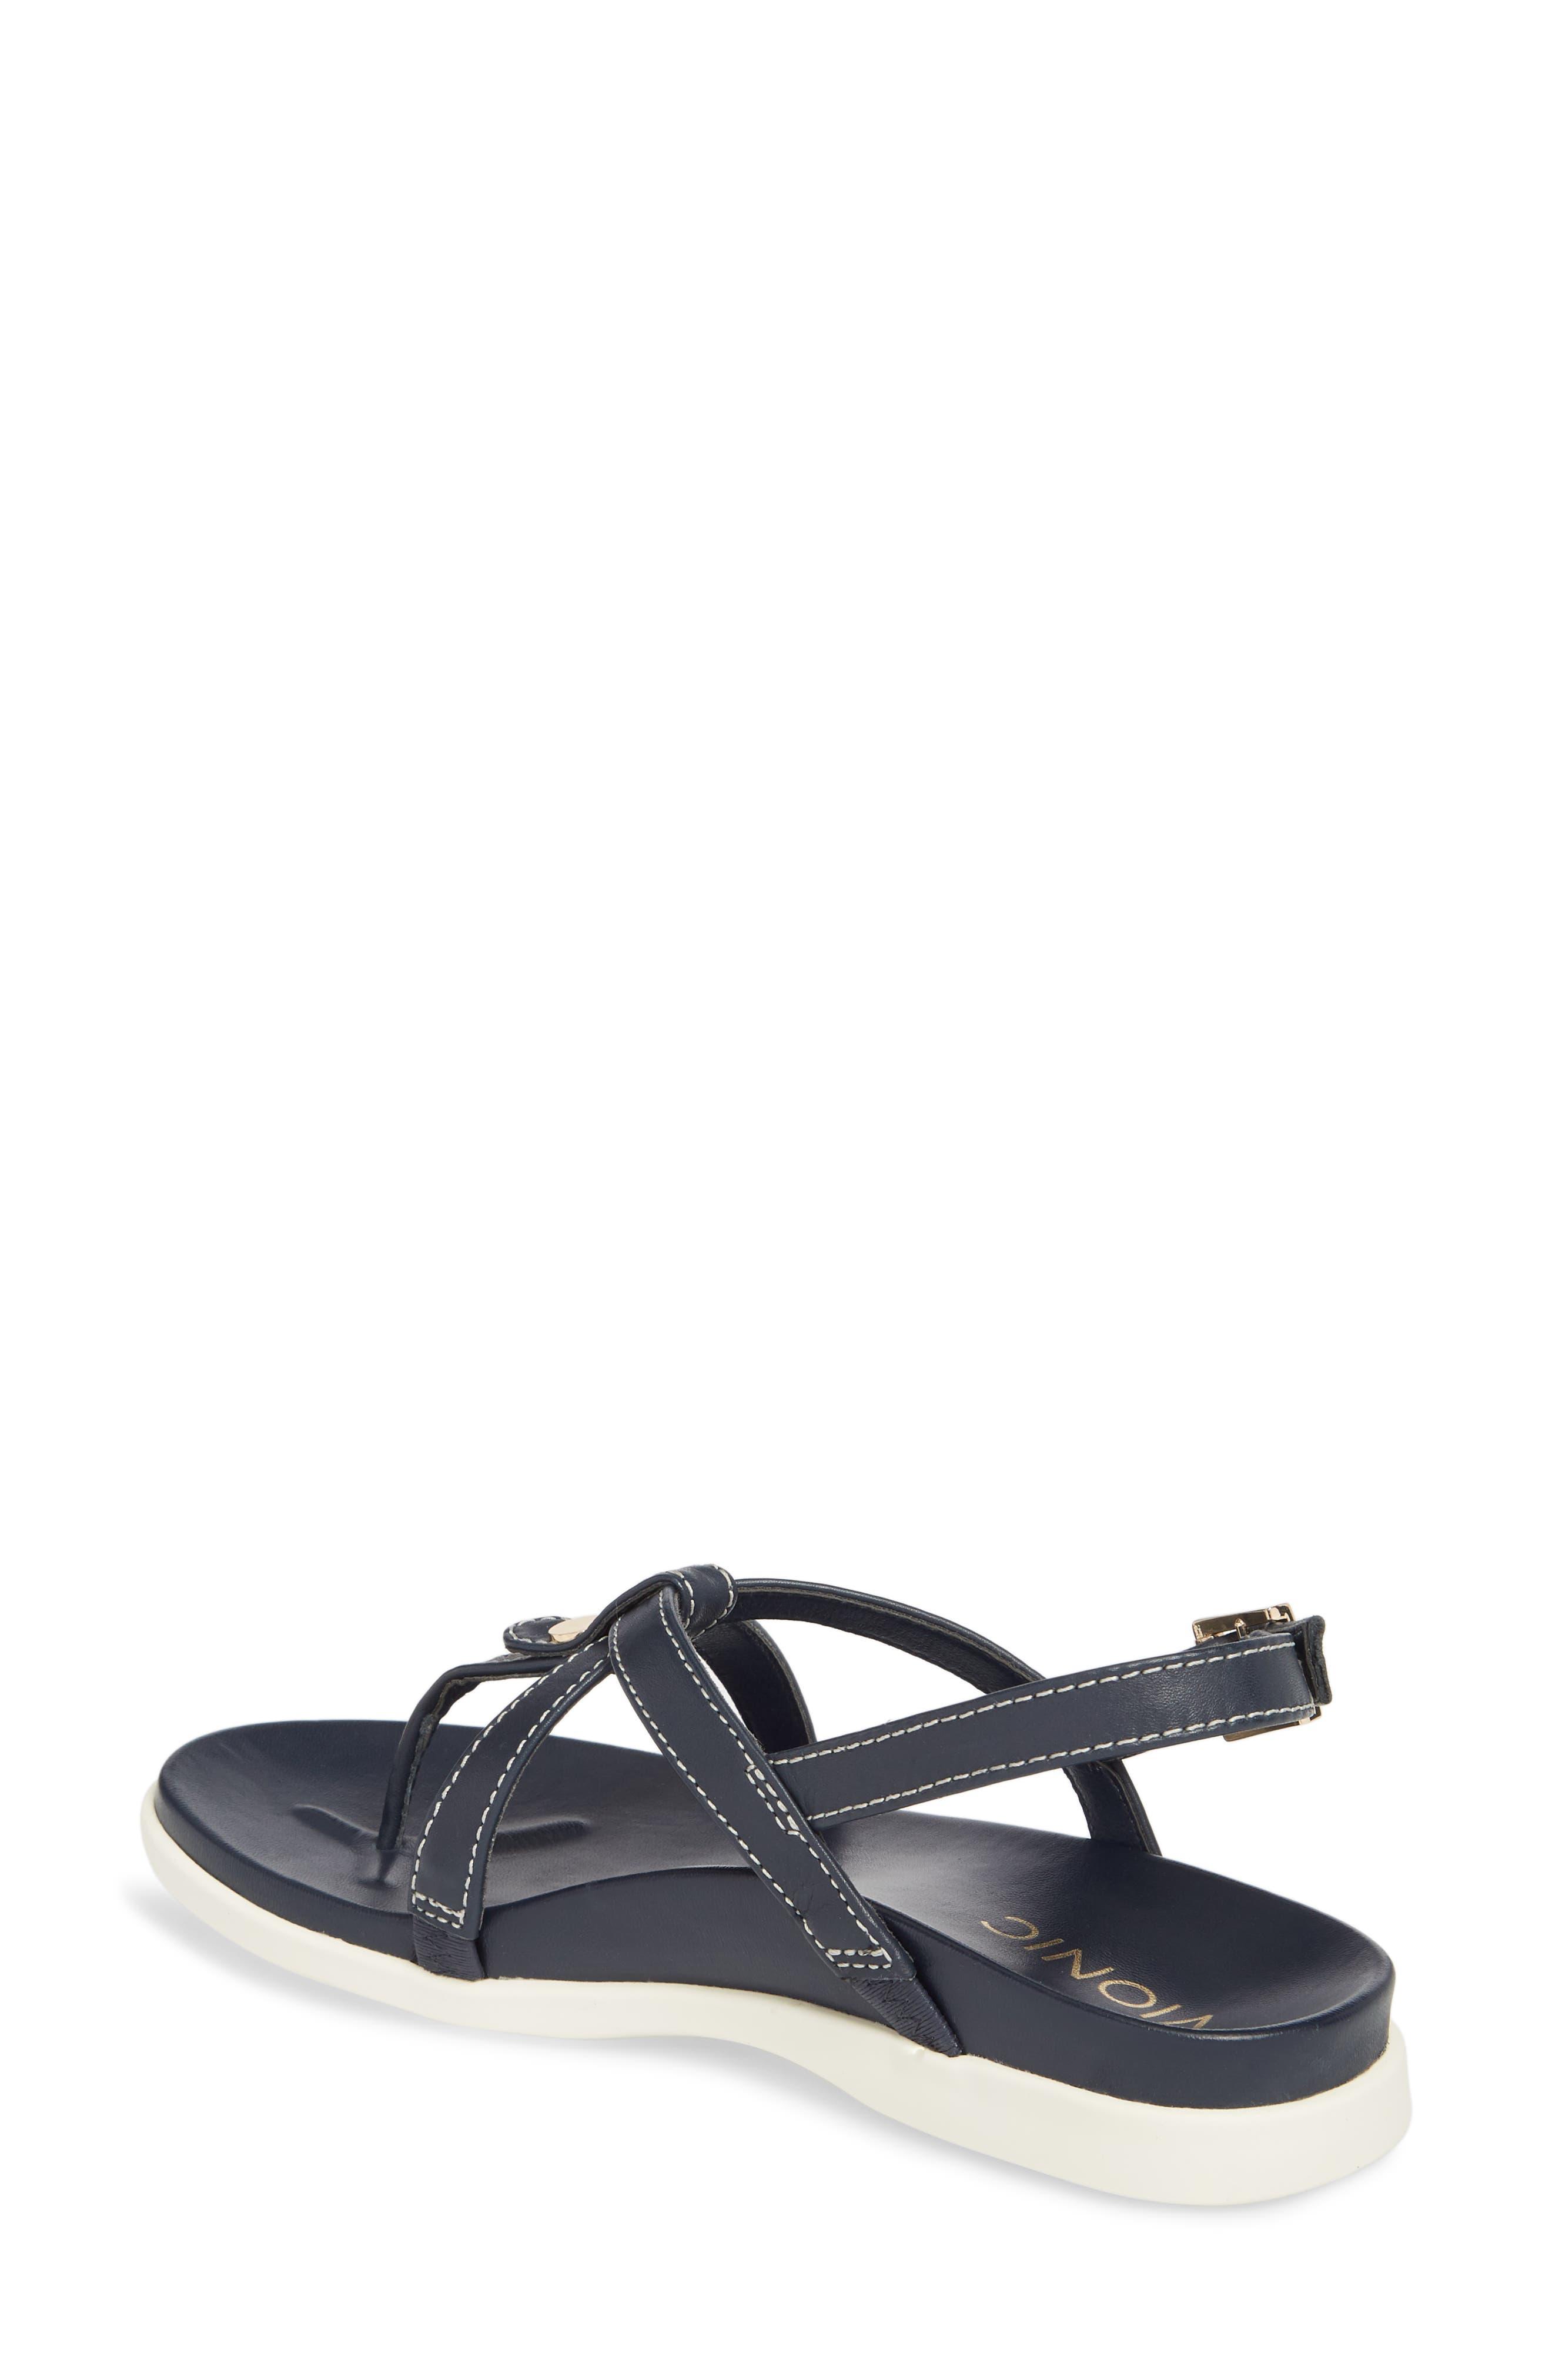 Veranda Orthaheel<sup>®</sup> Sandal,                             Alternate thumbnail 2, color,                             Navy Leather